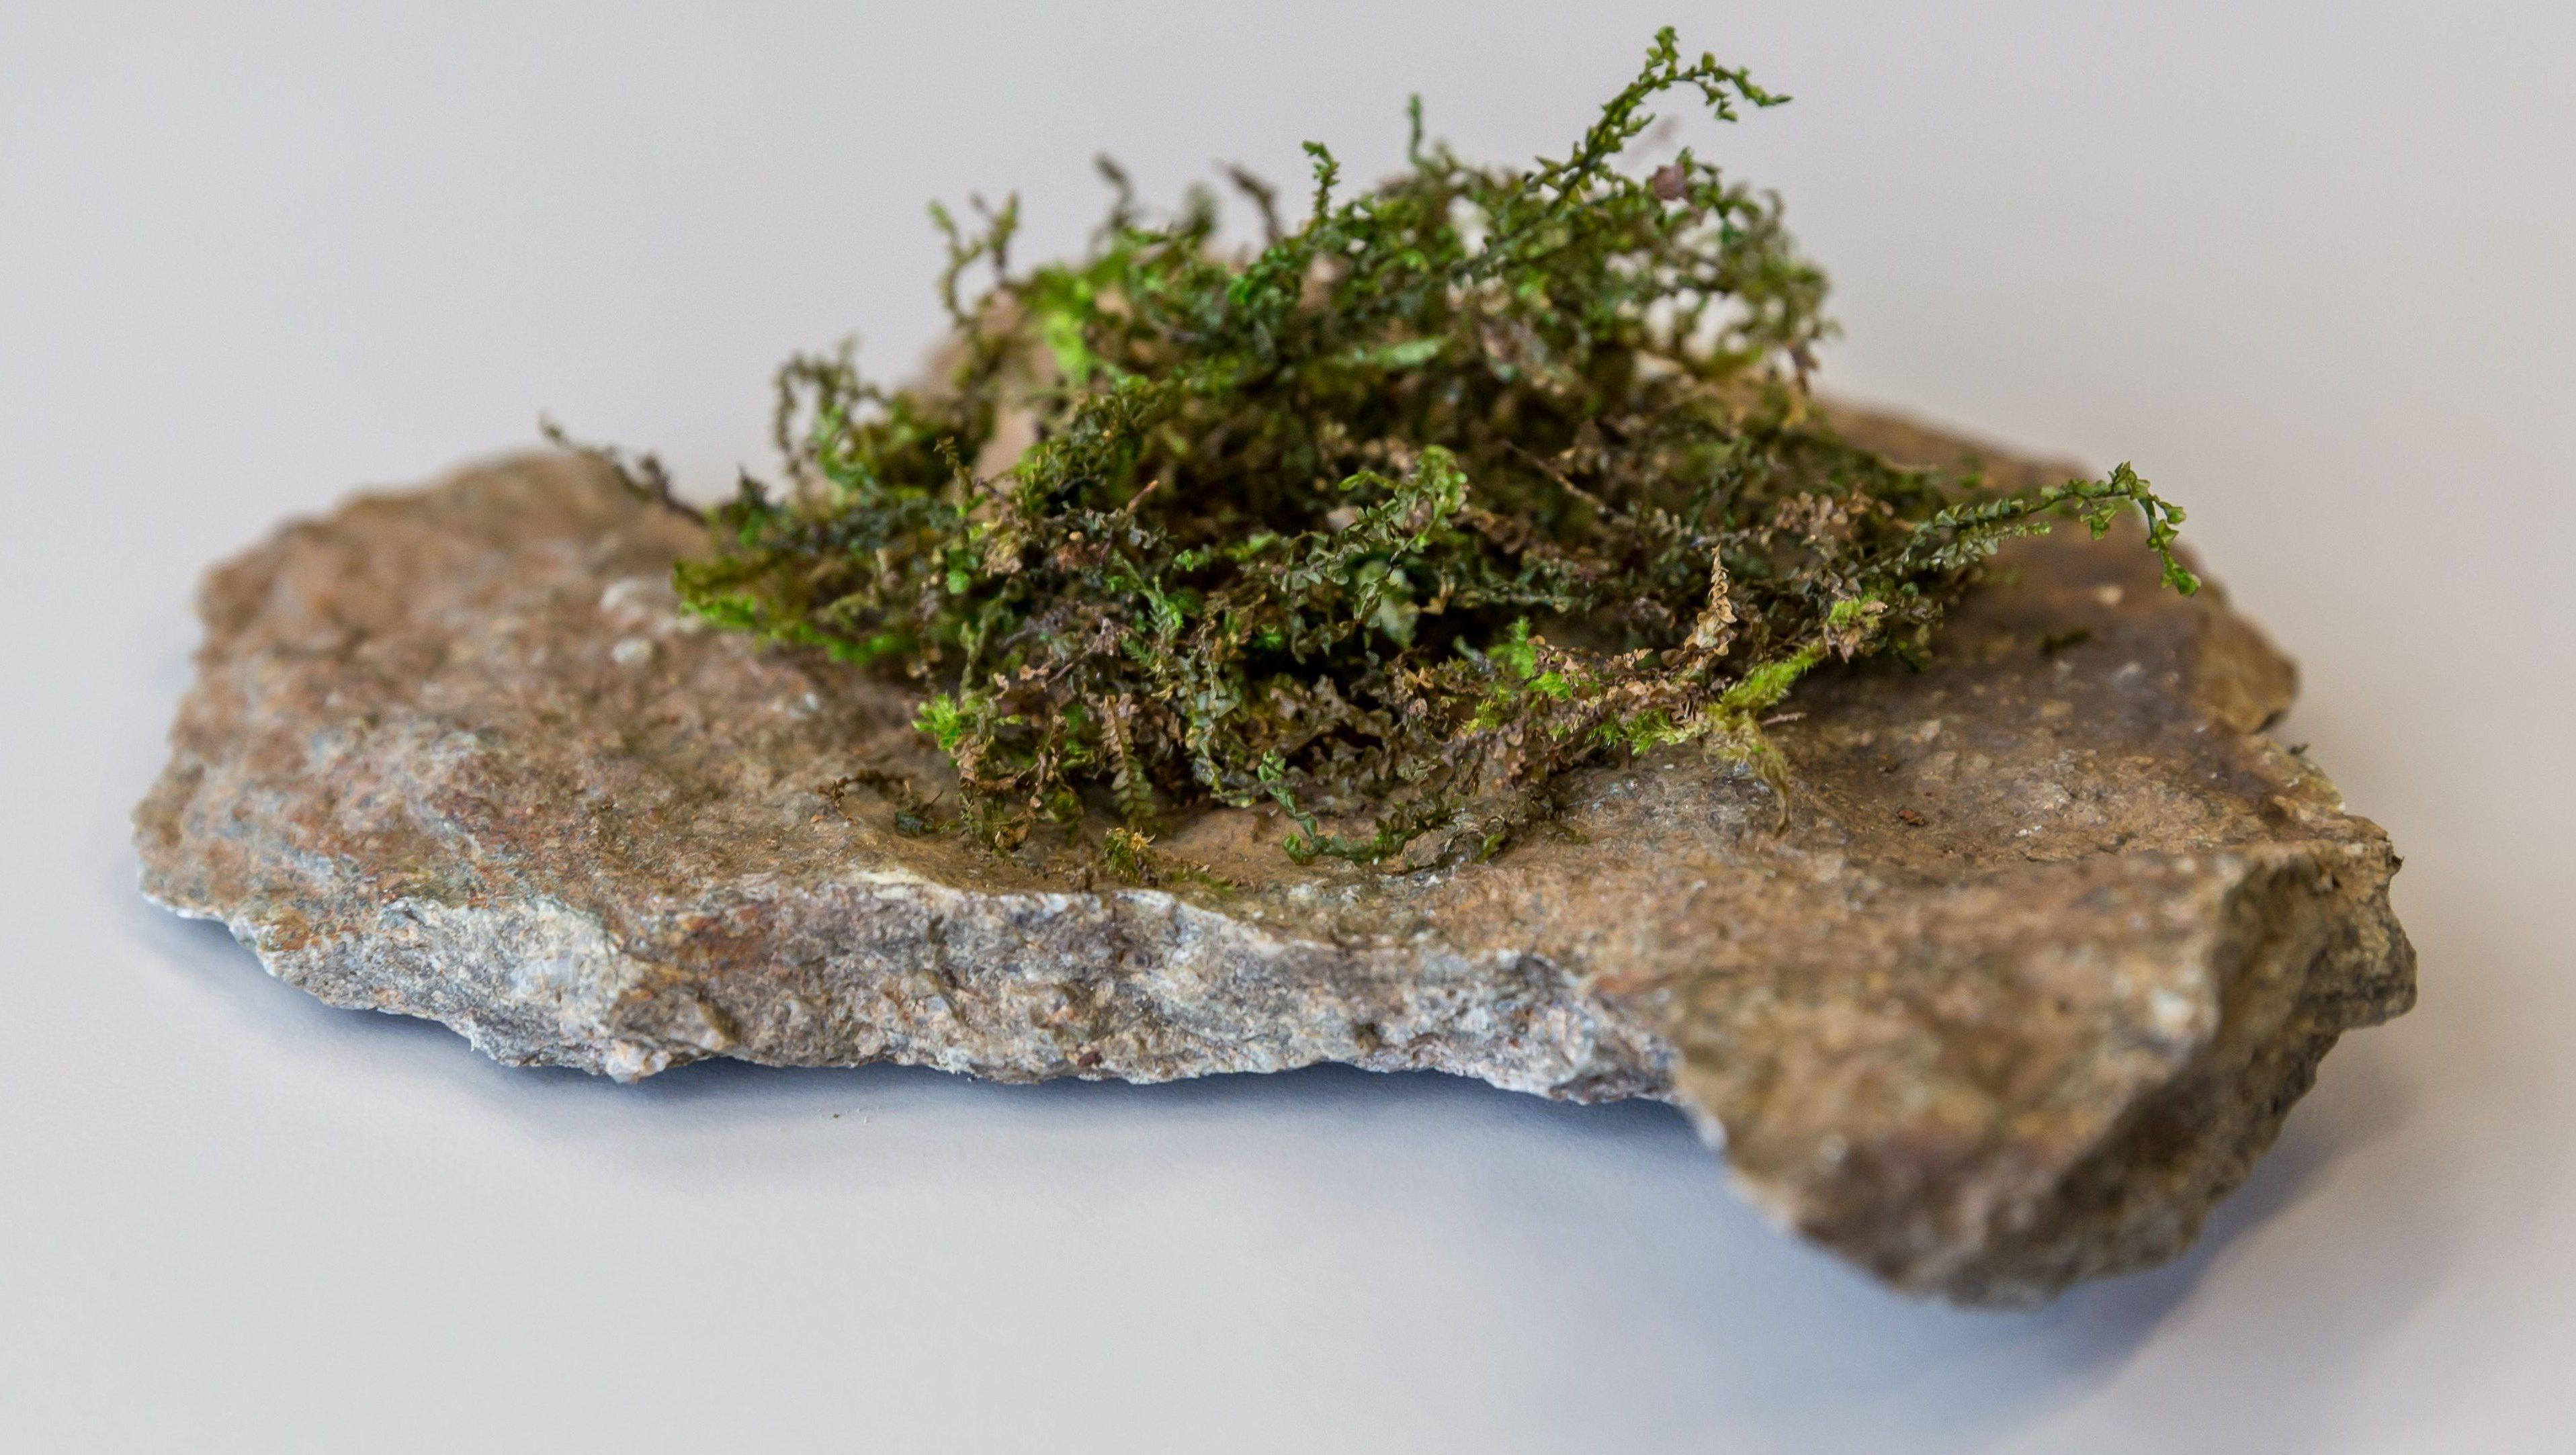 Liverwort growing on a rock.